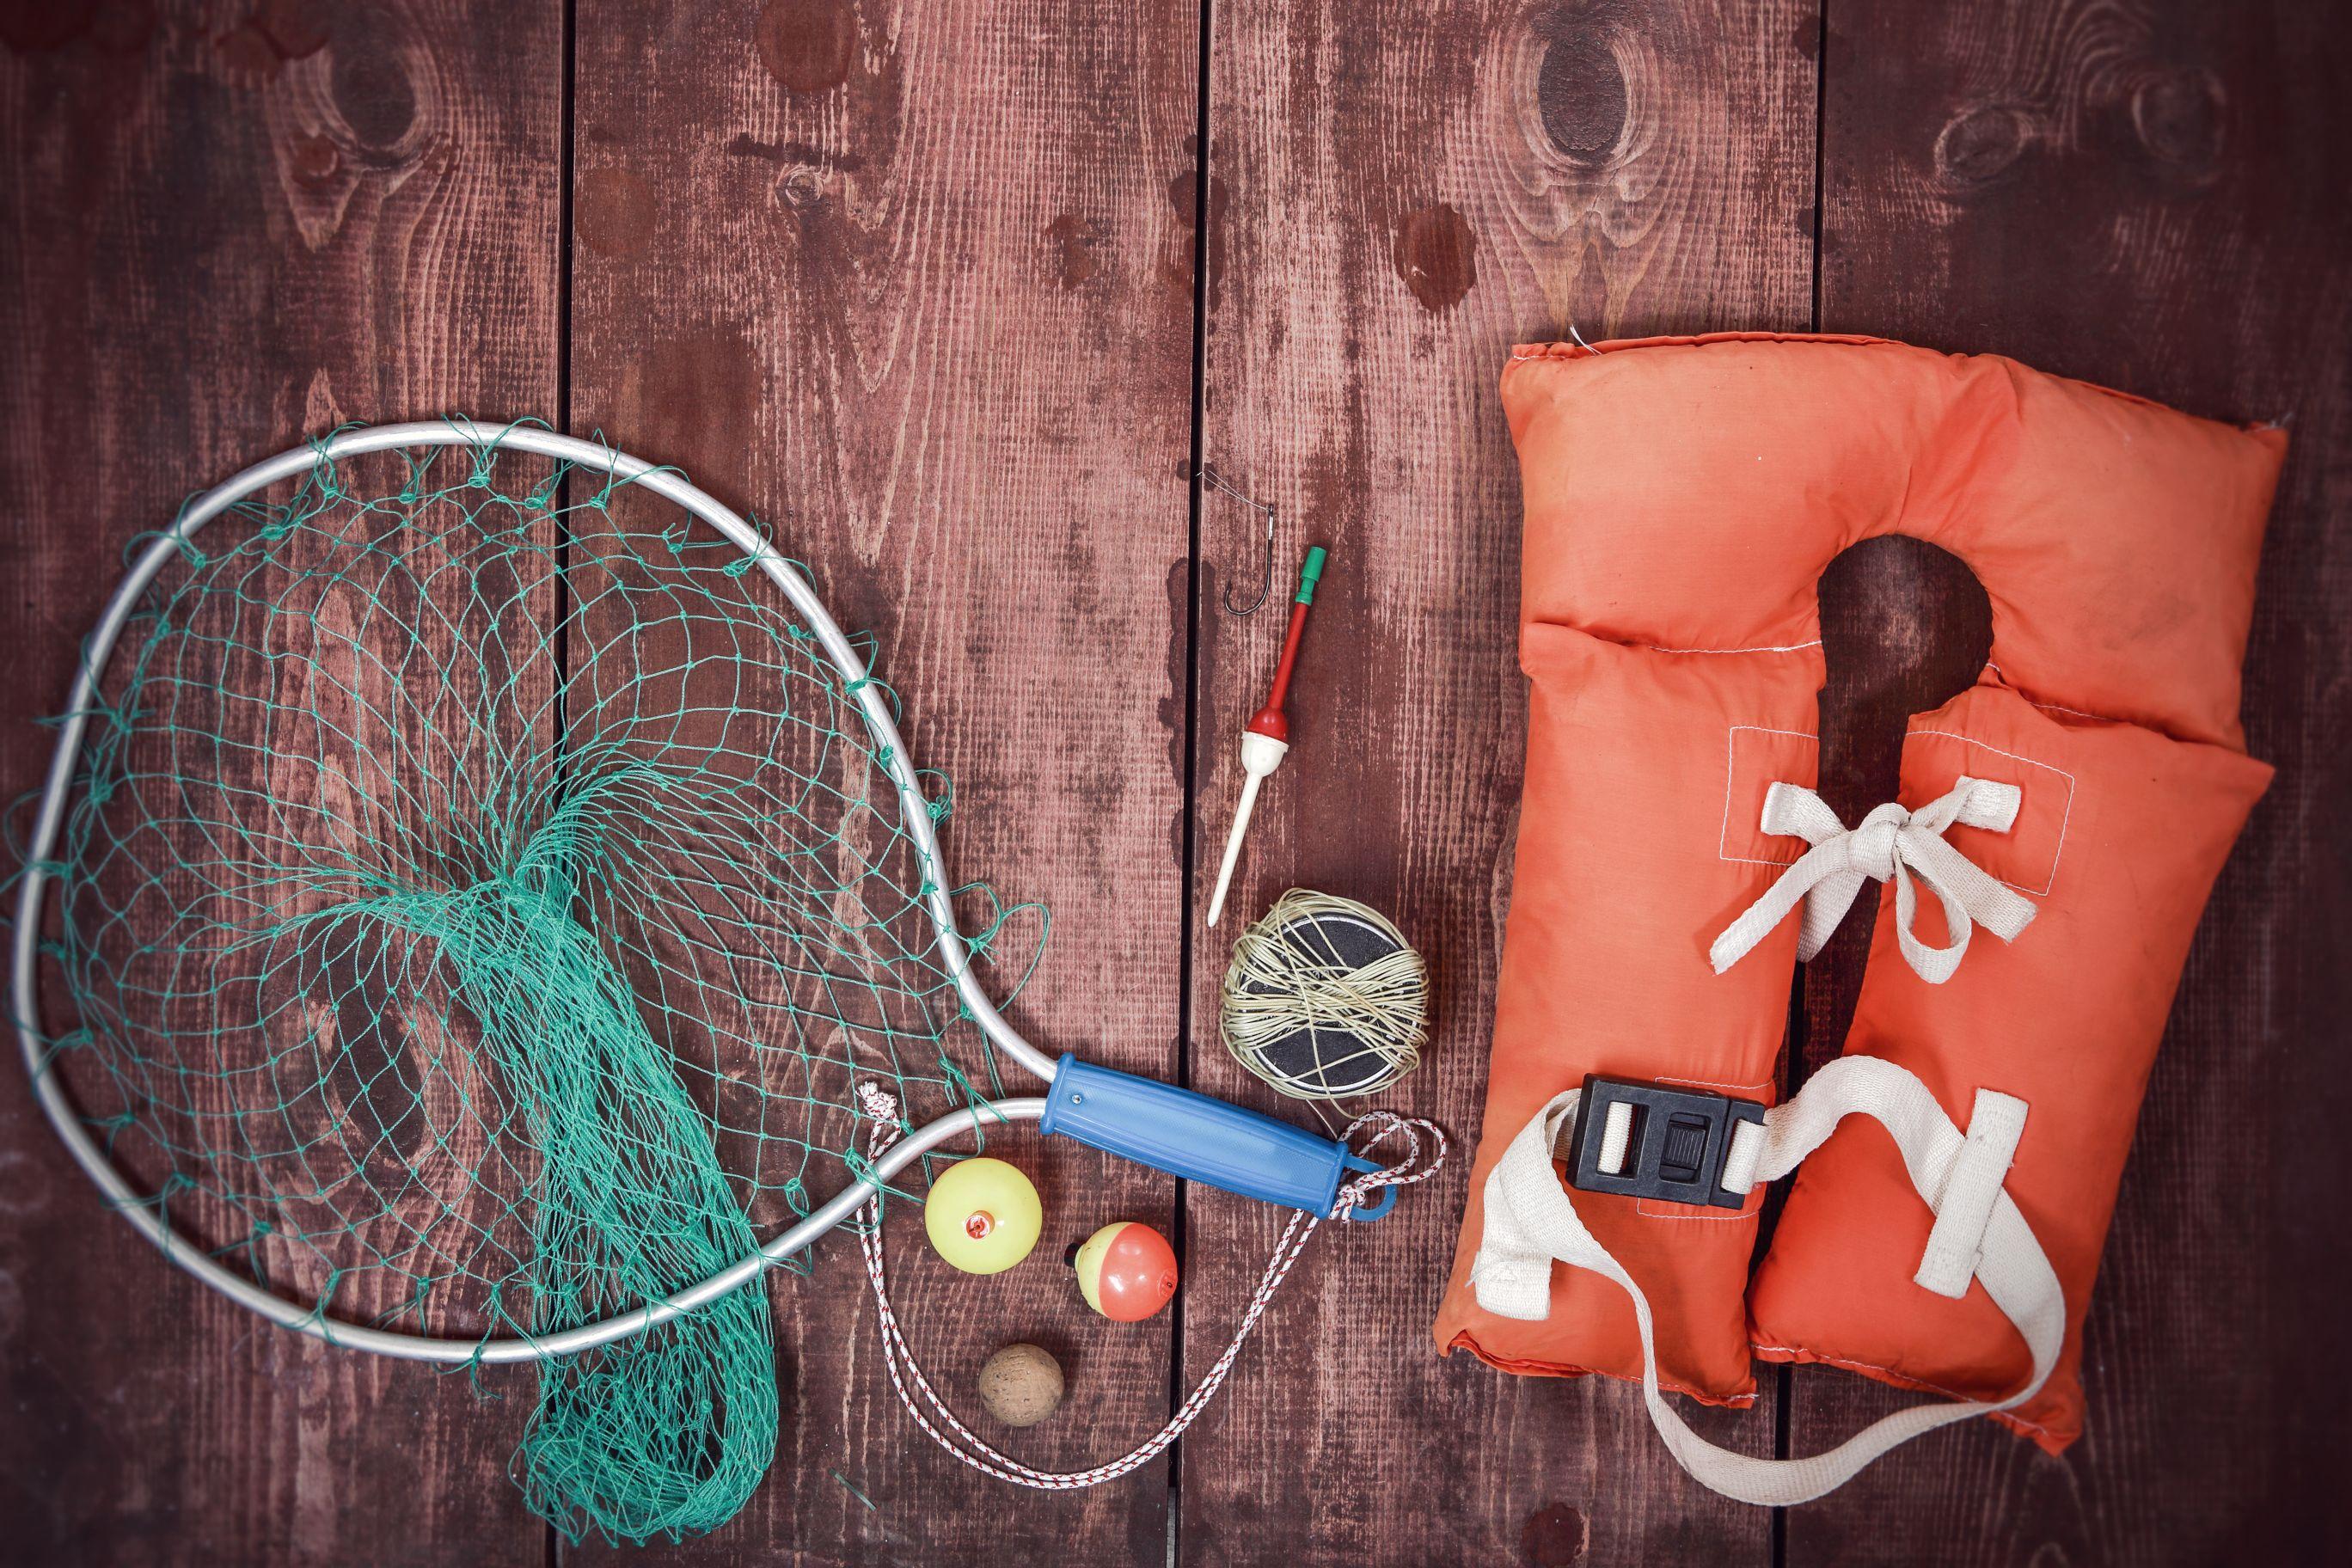 Fishermens Supplies